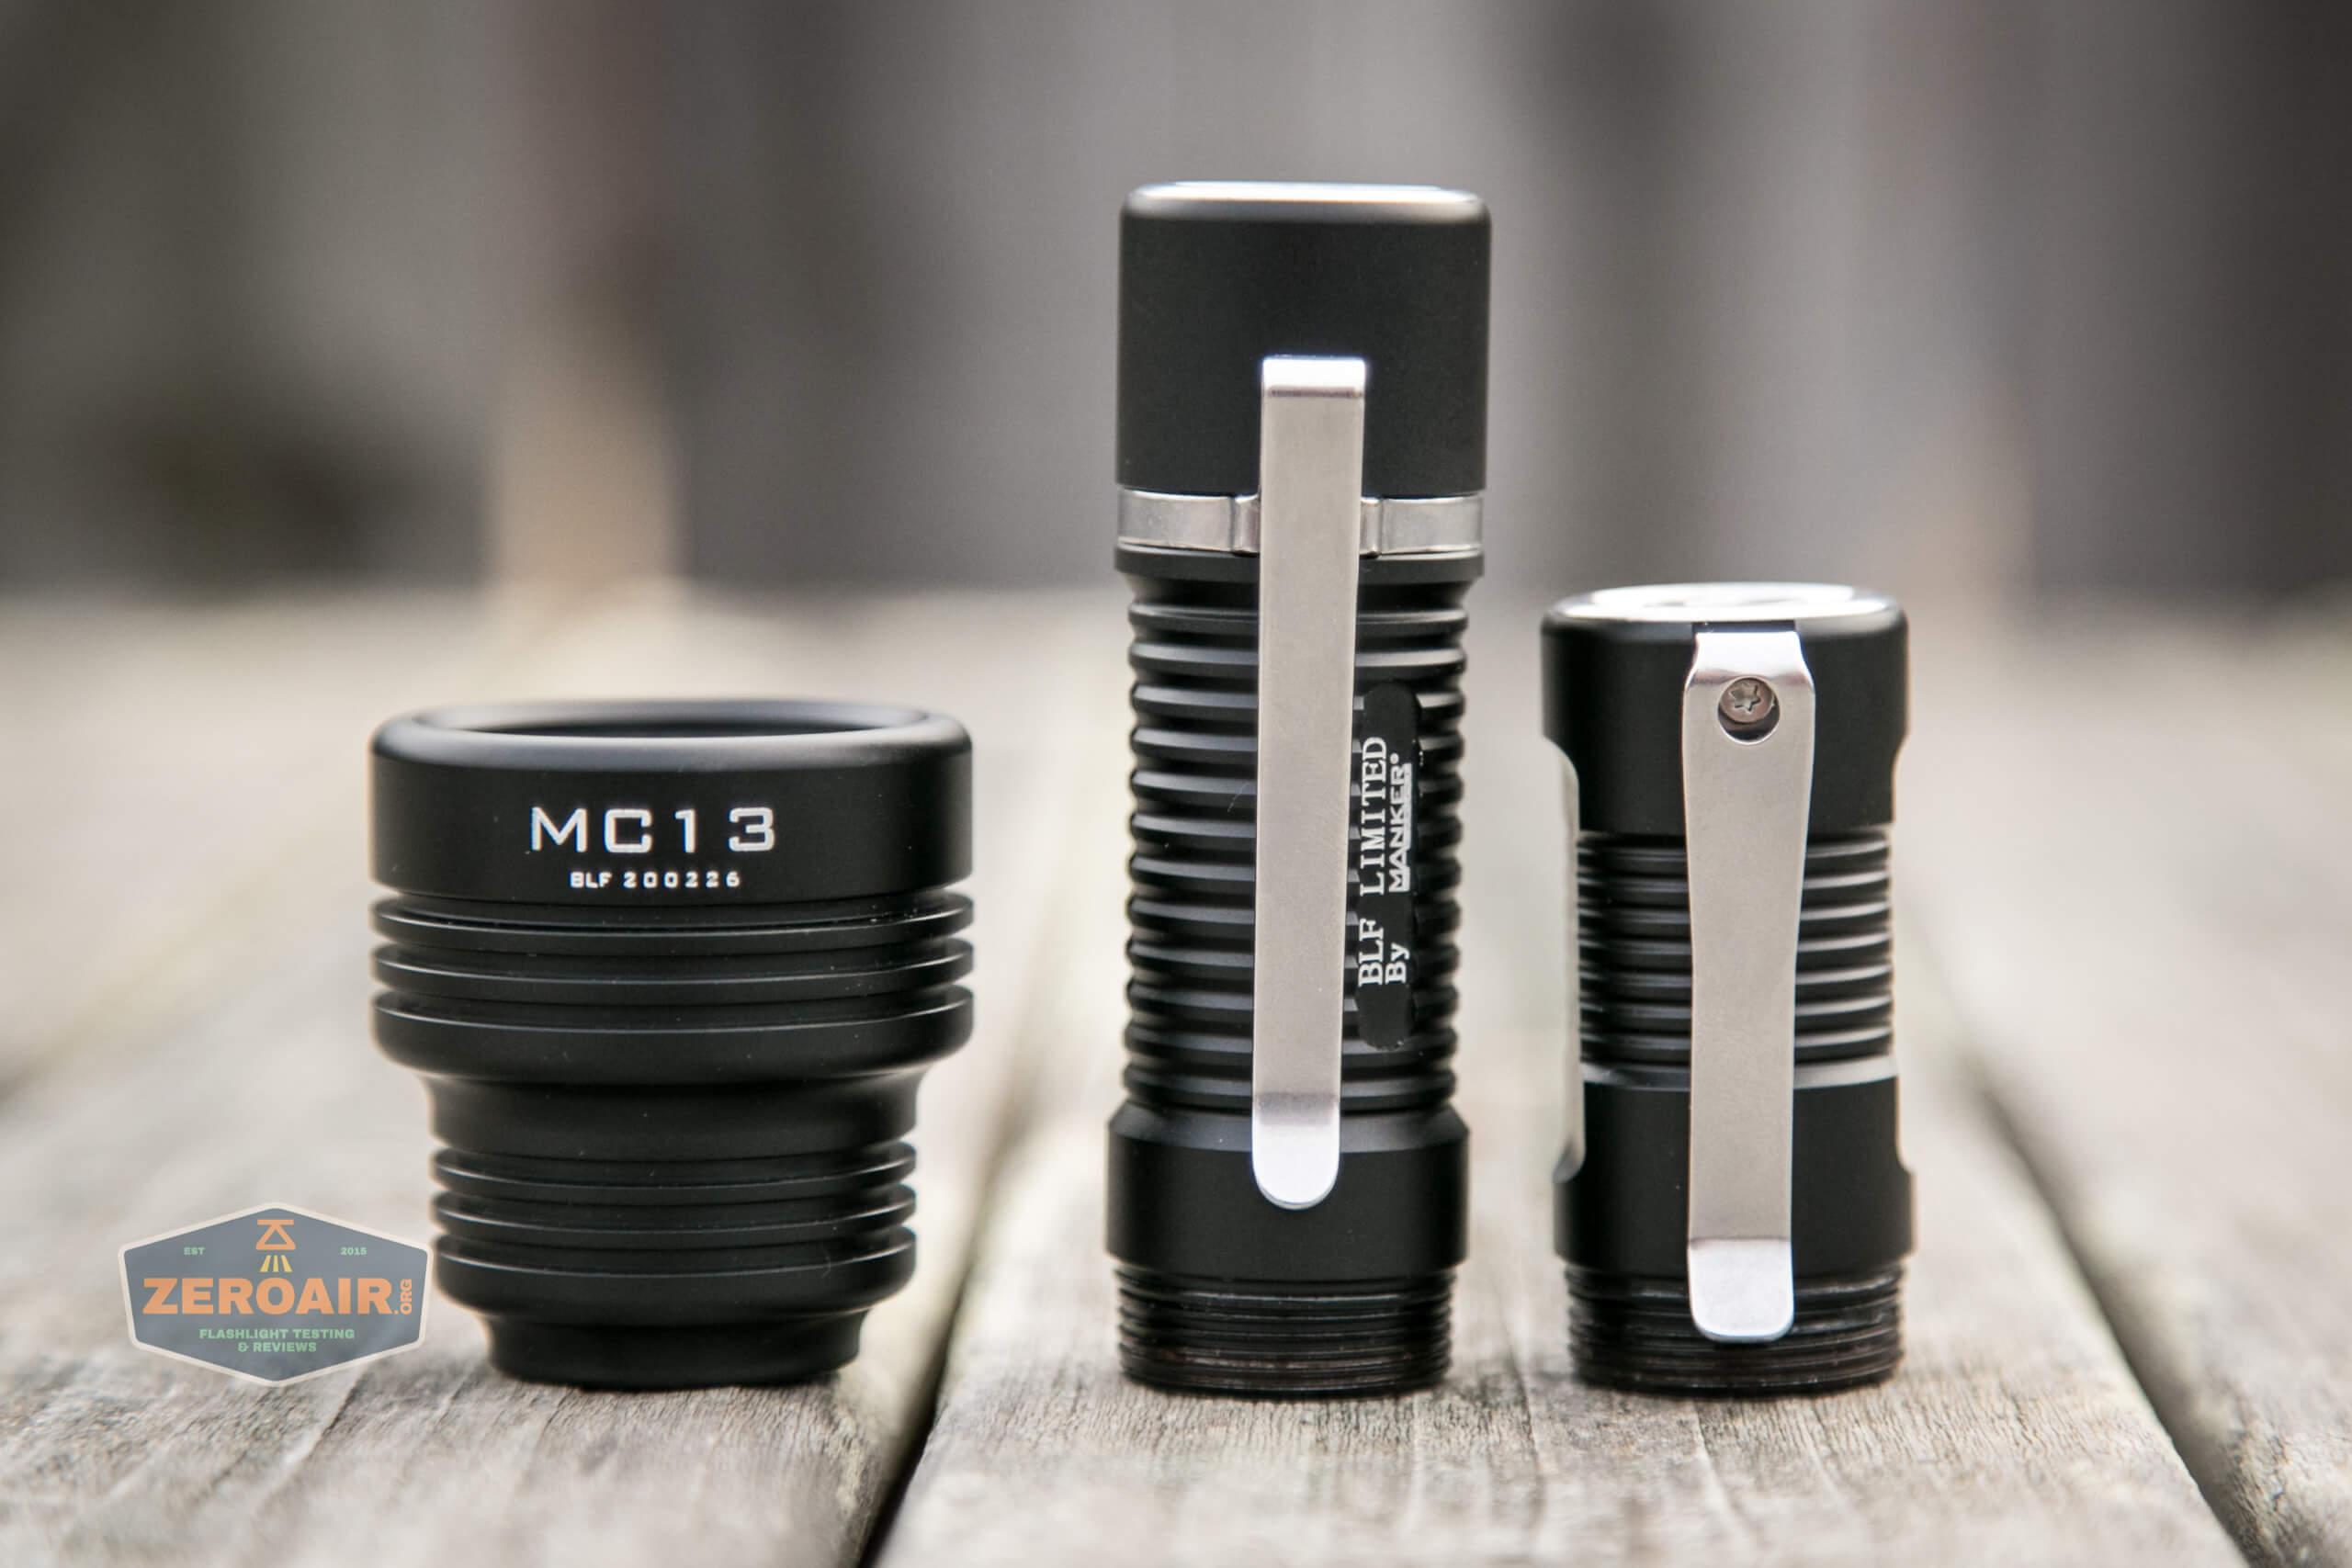 Manker MC13 thrower flashlight both bodies and head